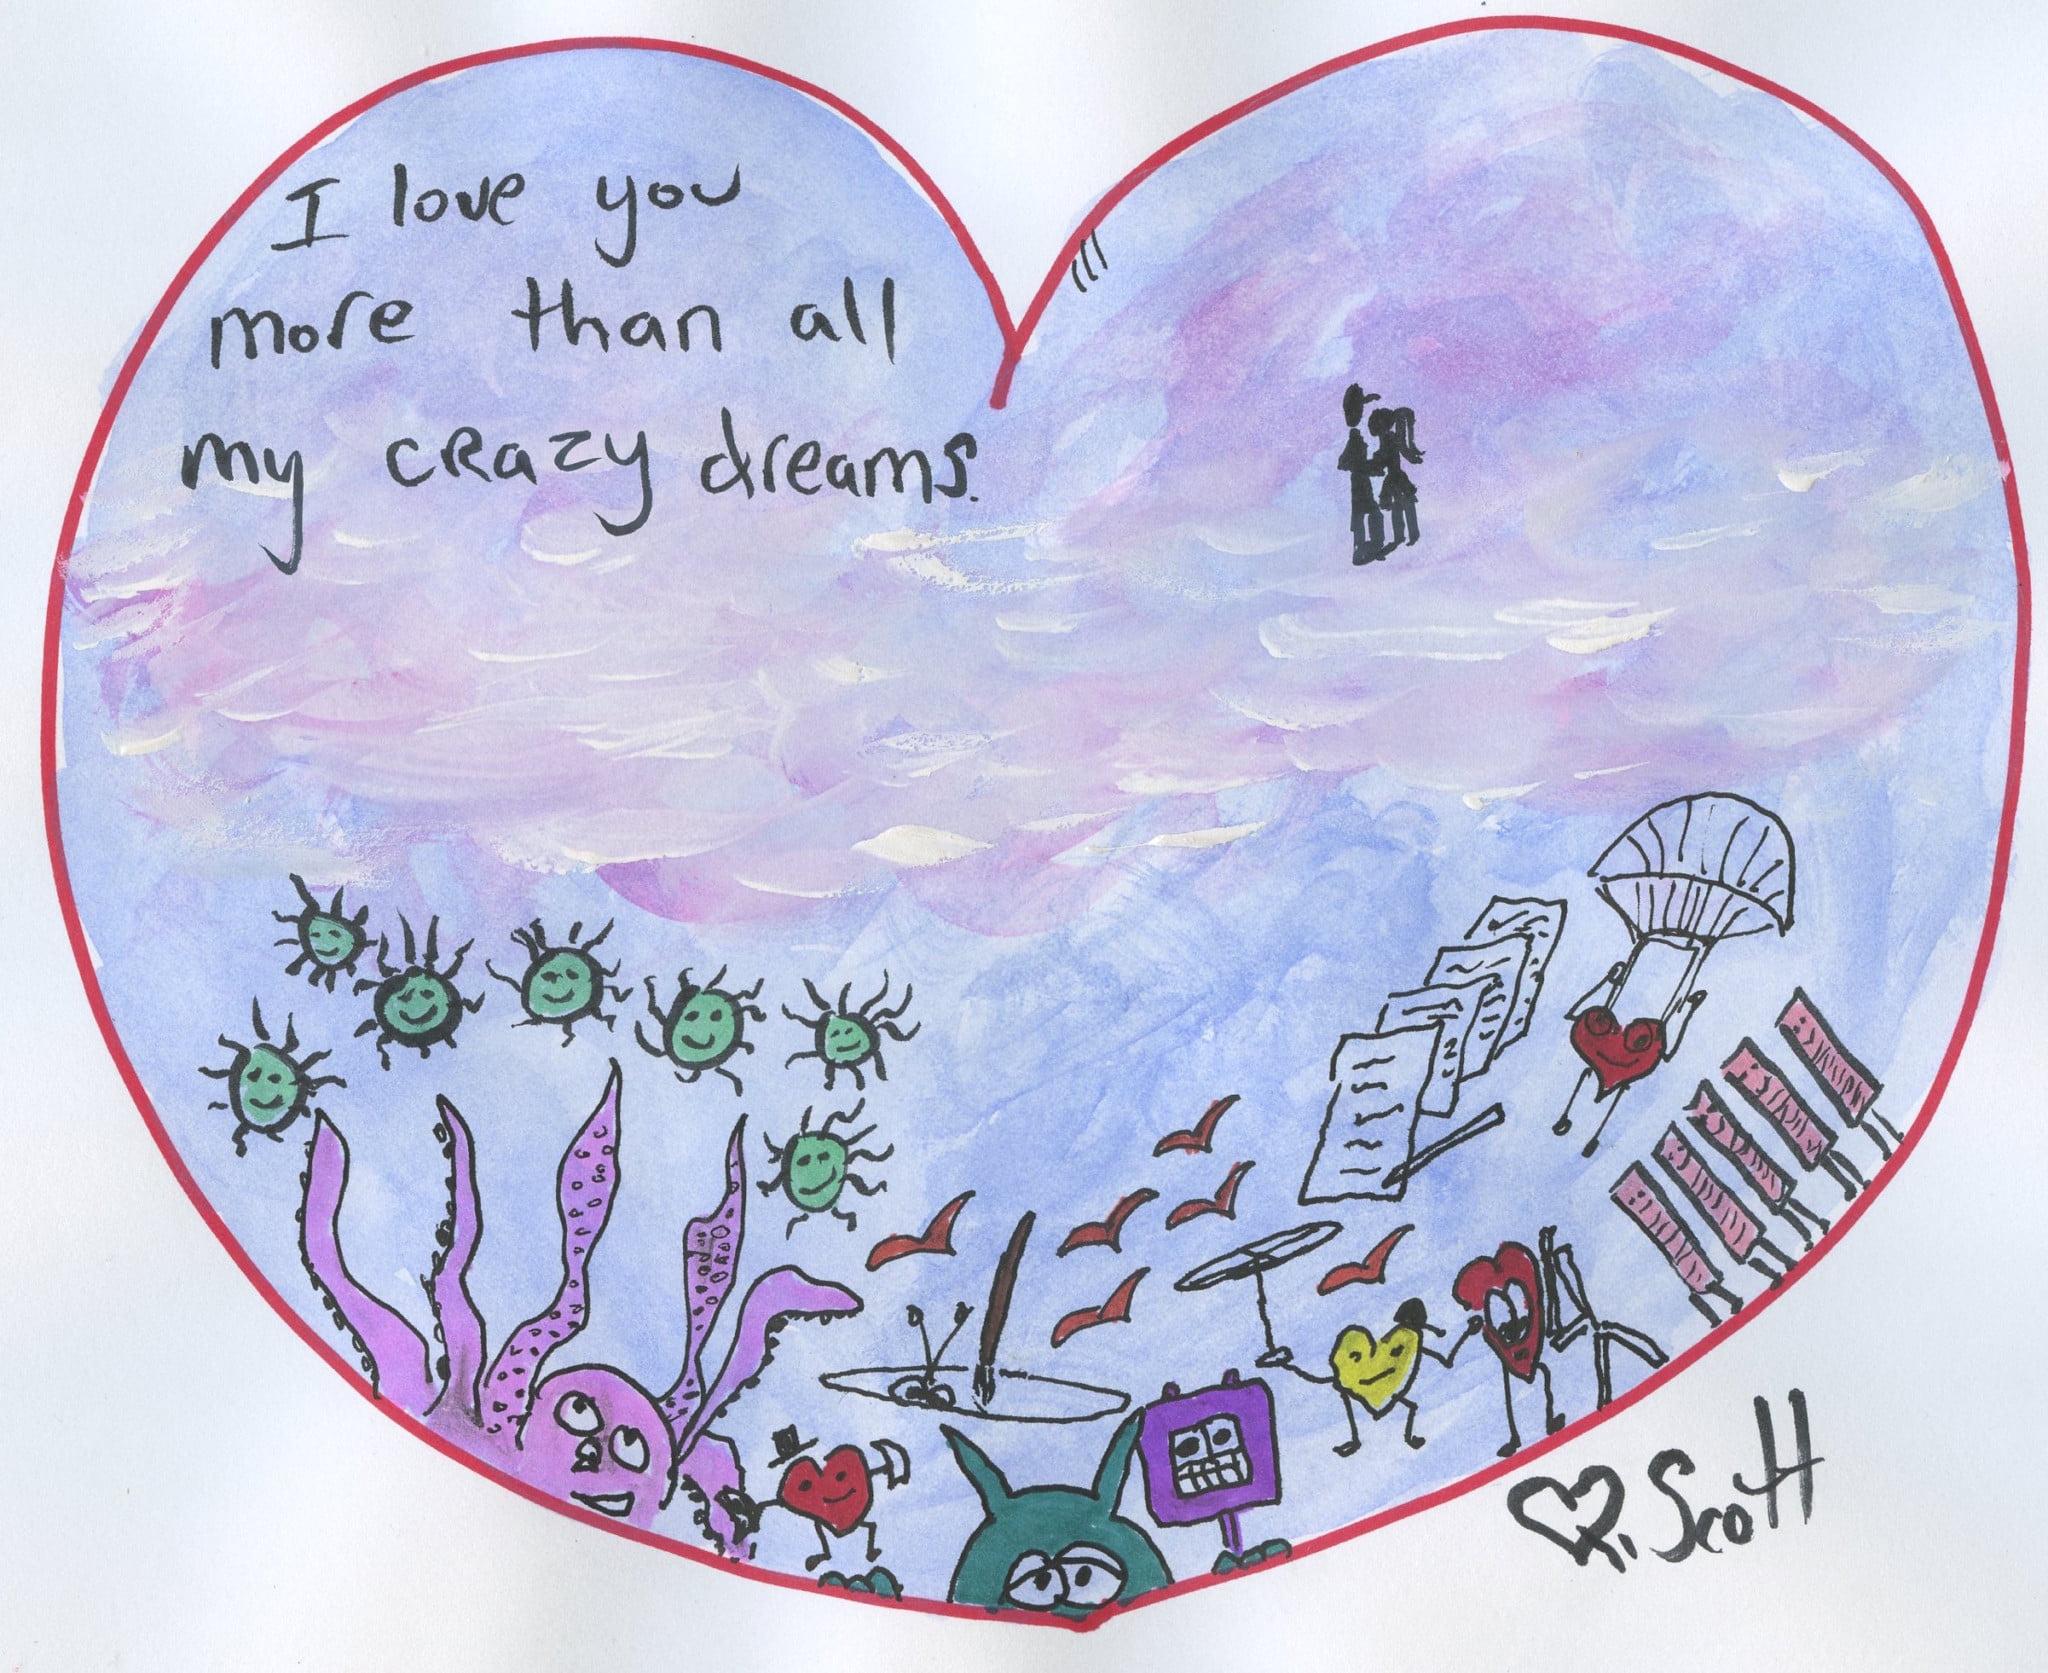 heart, love, kindness